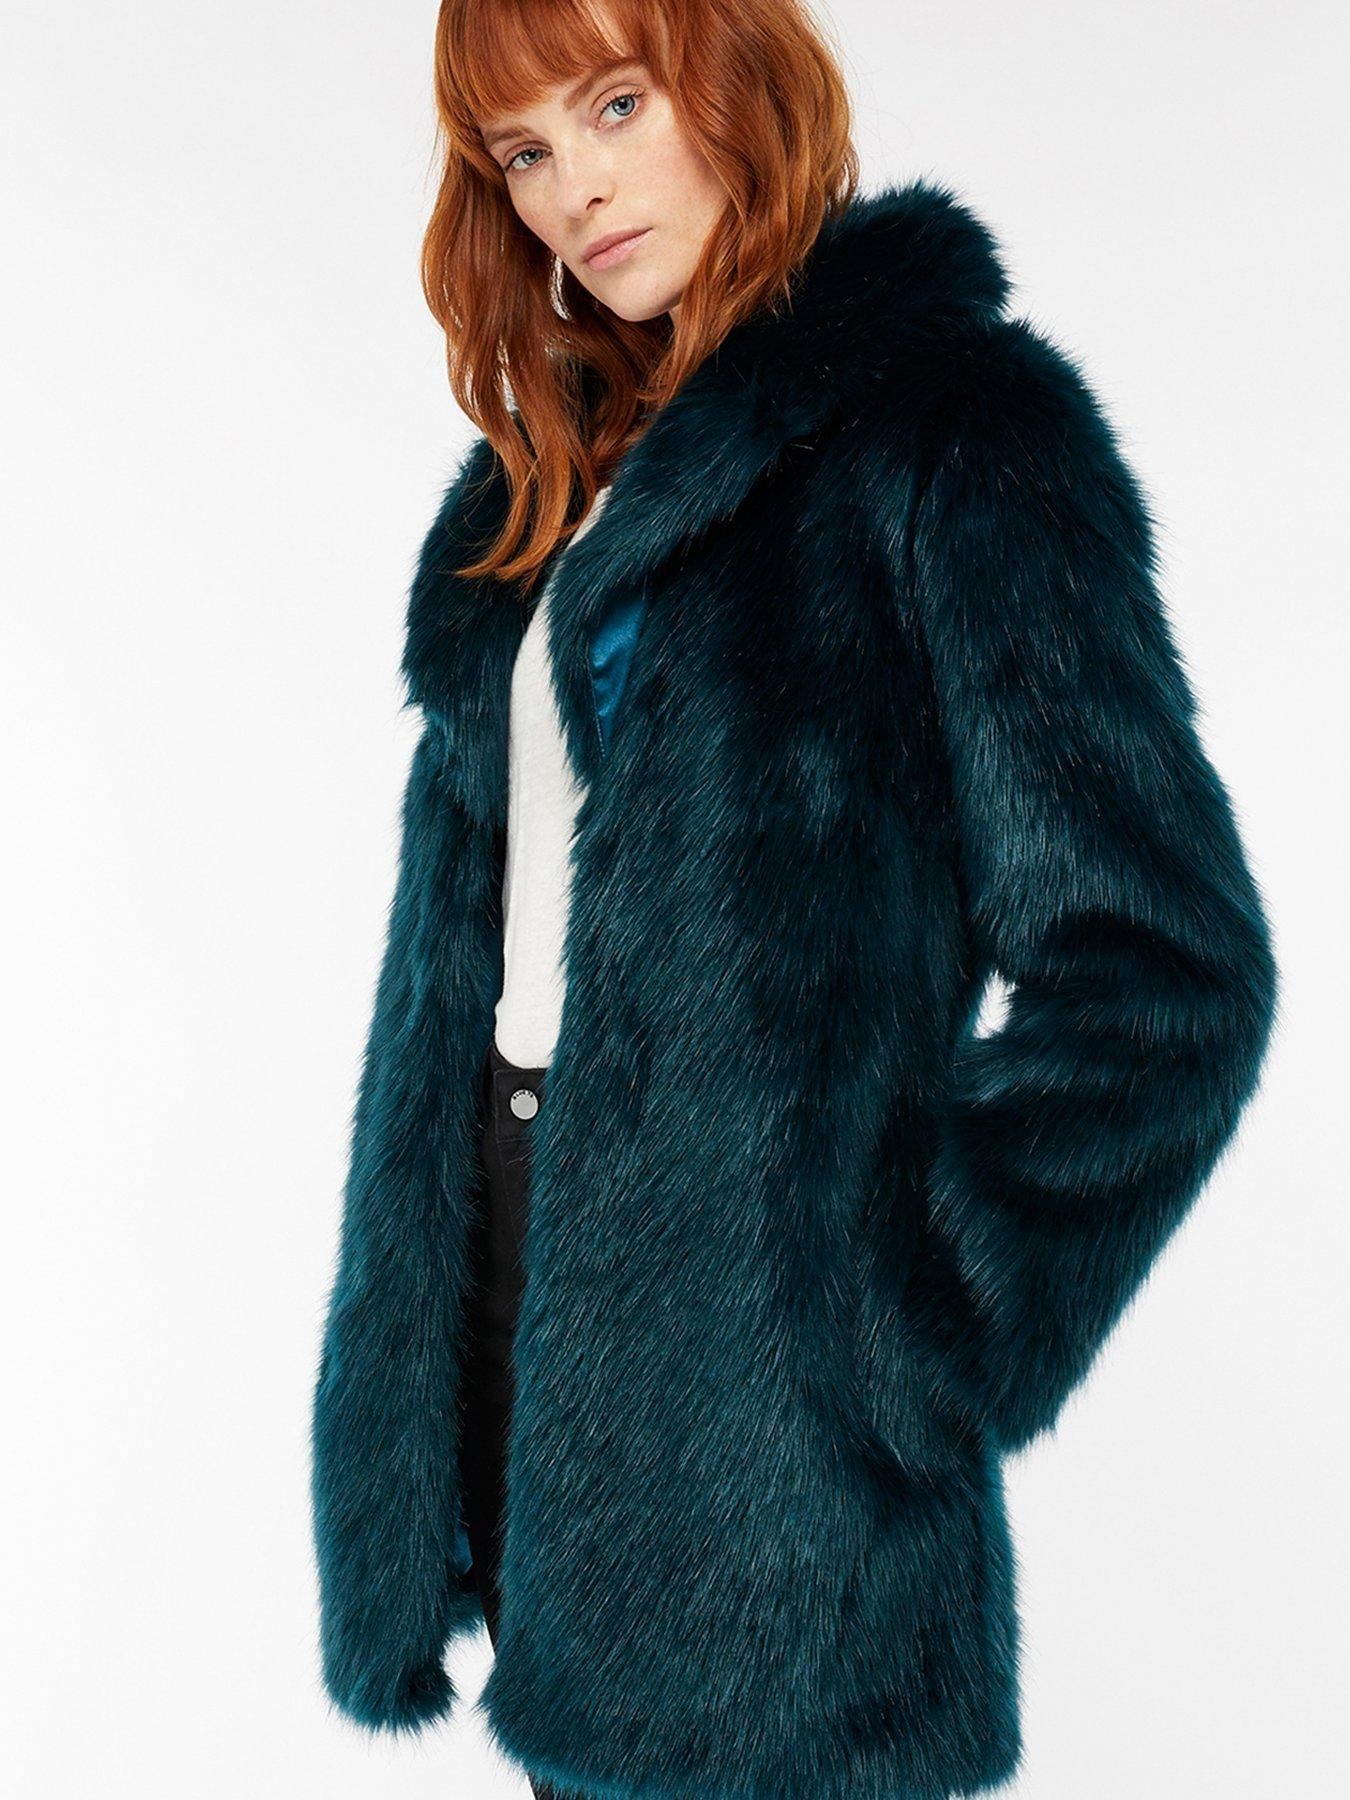 795a241c5e2 Freddie Faux Fur Jacket - Teal | Ultimate Top Layers | Faux fur ...